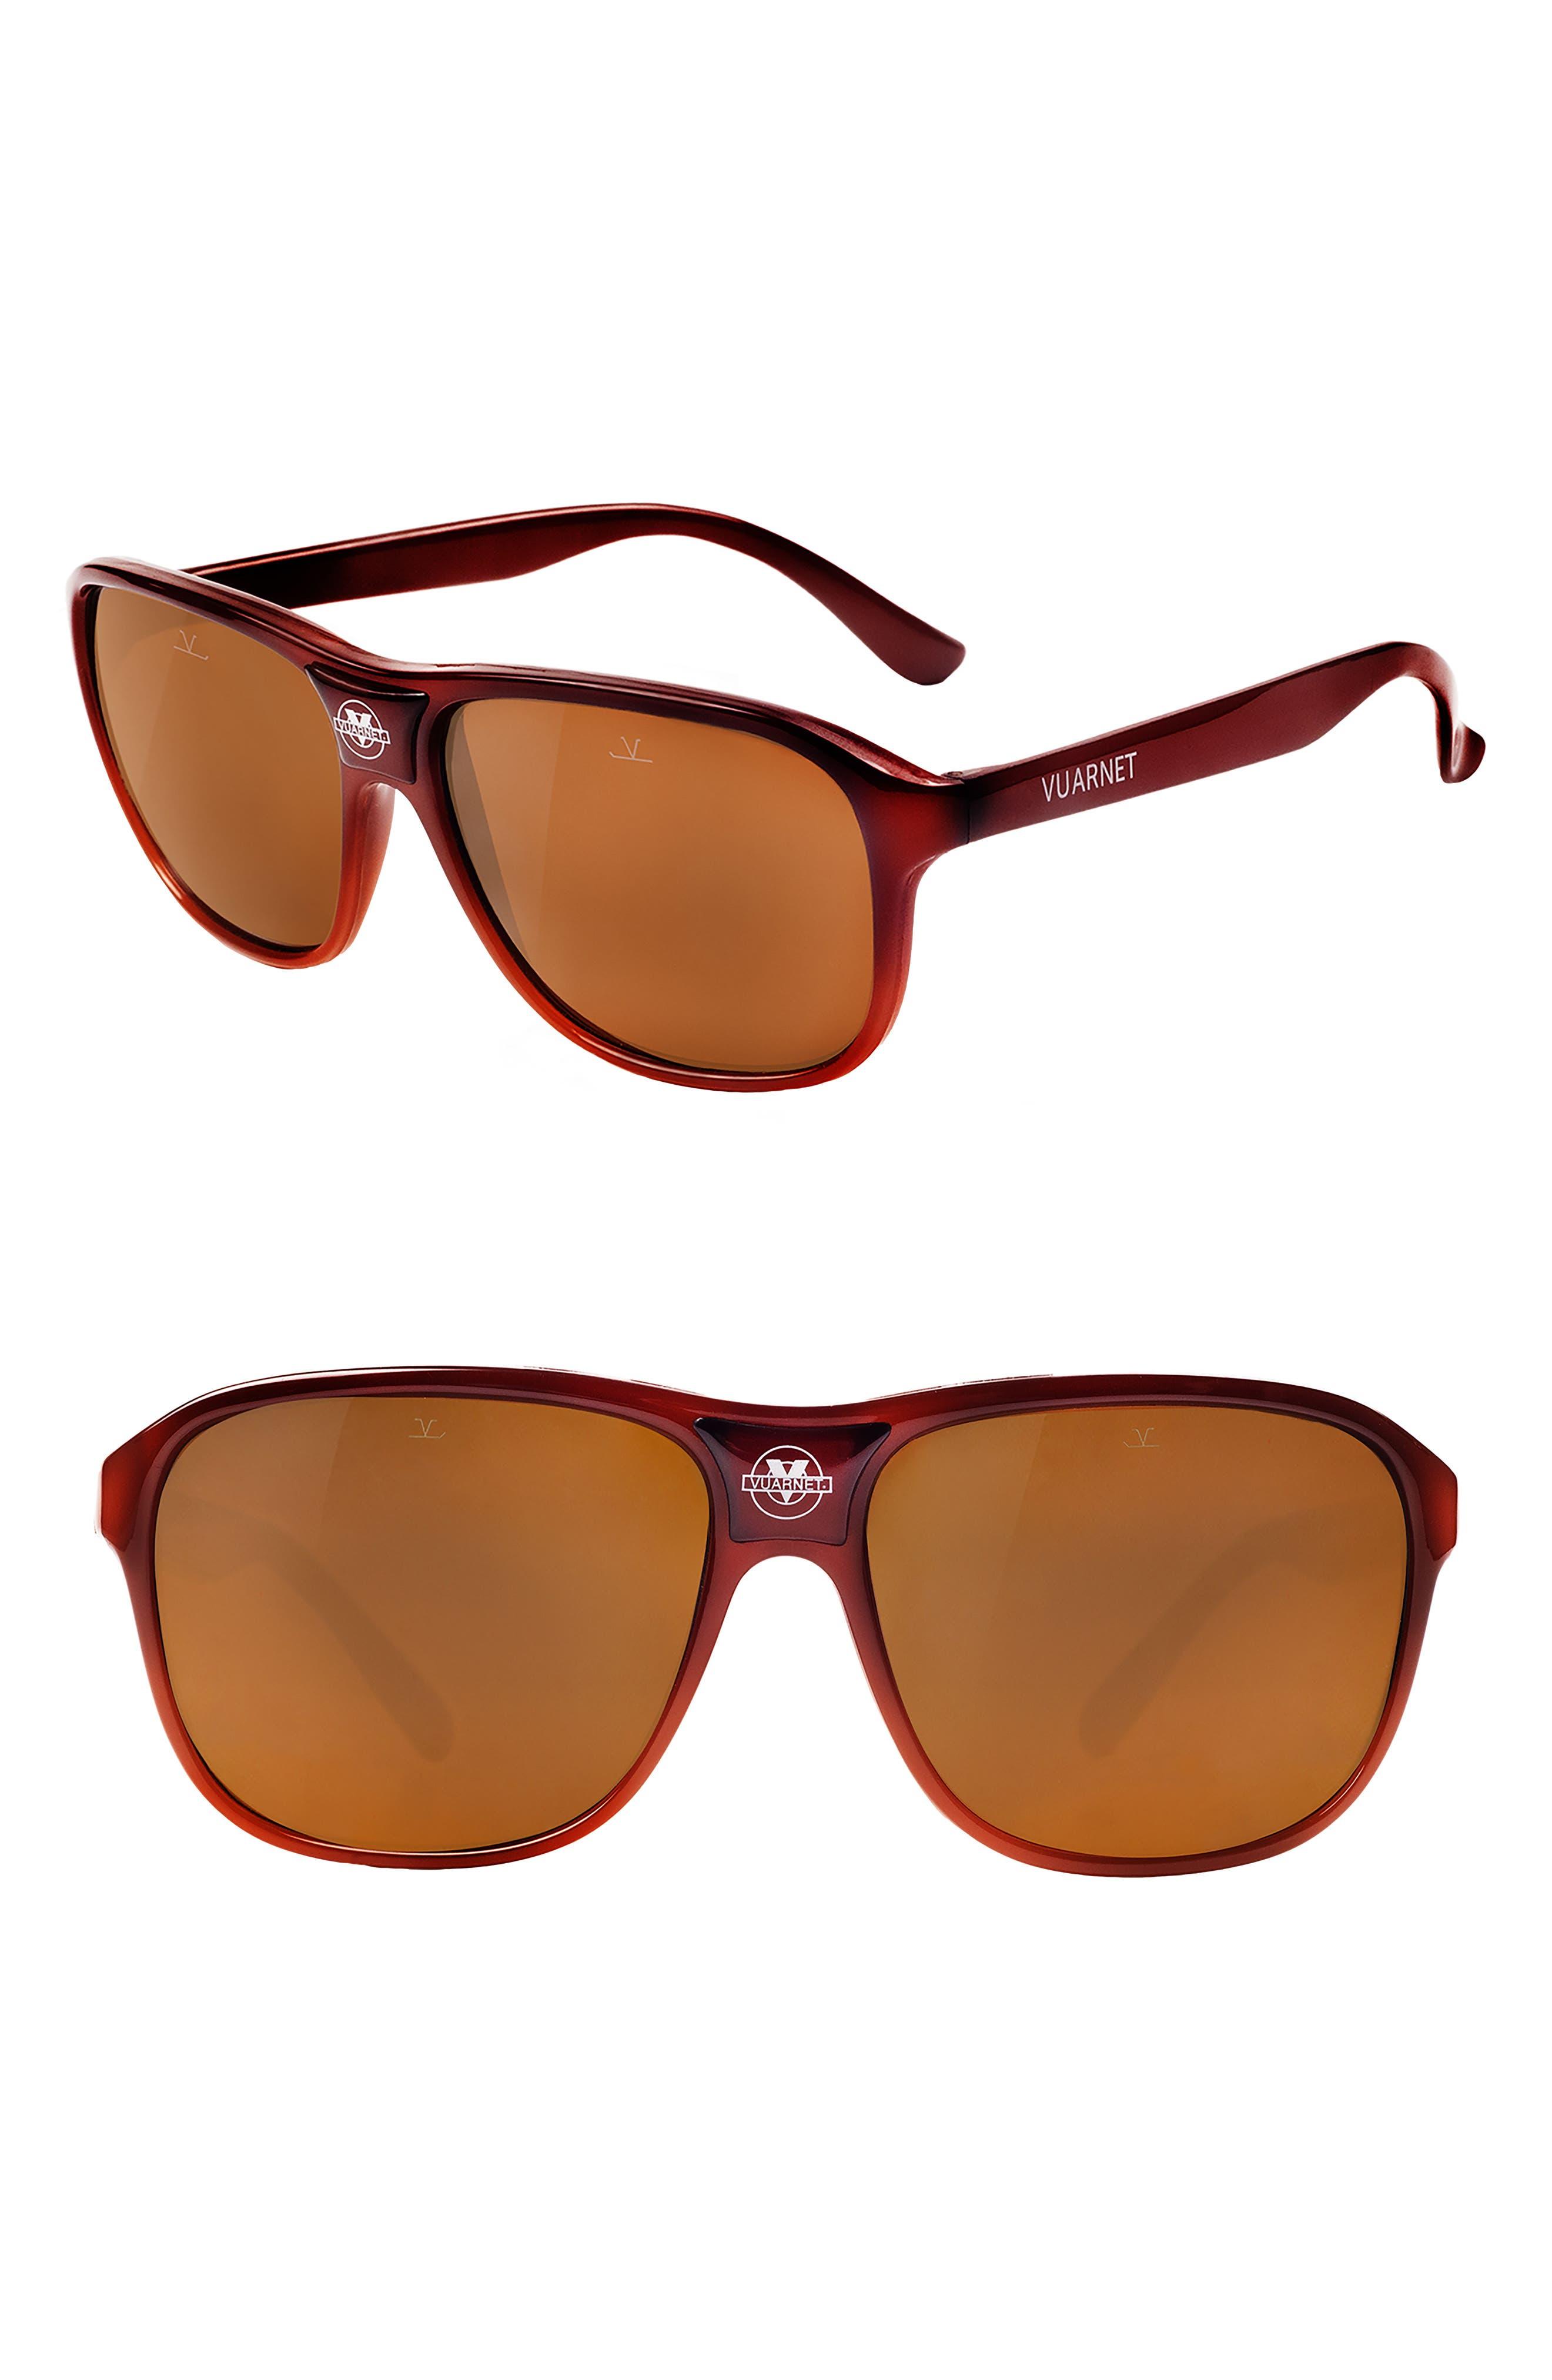 Legends 03 56mm Polarized Sunglasses,                         Main,                         color, GRADIENT BROWN